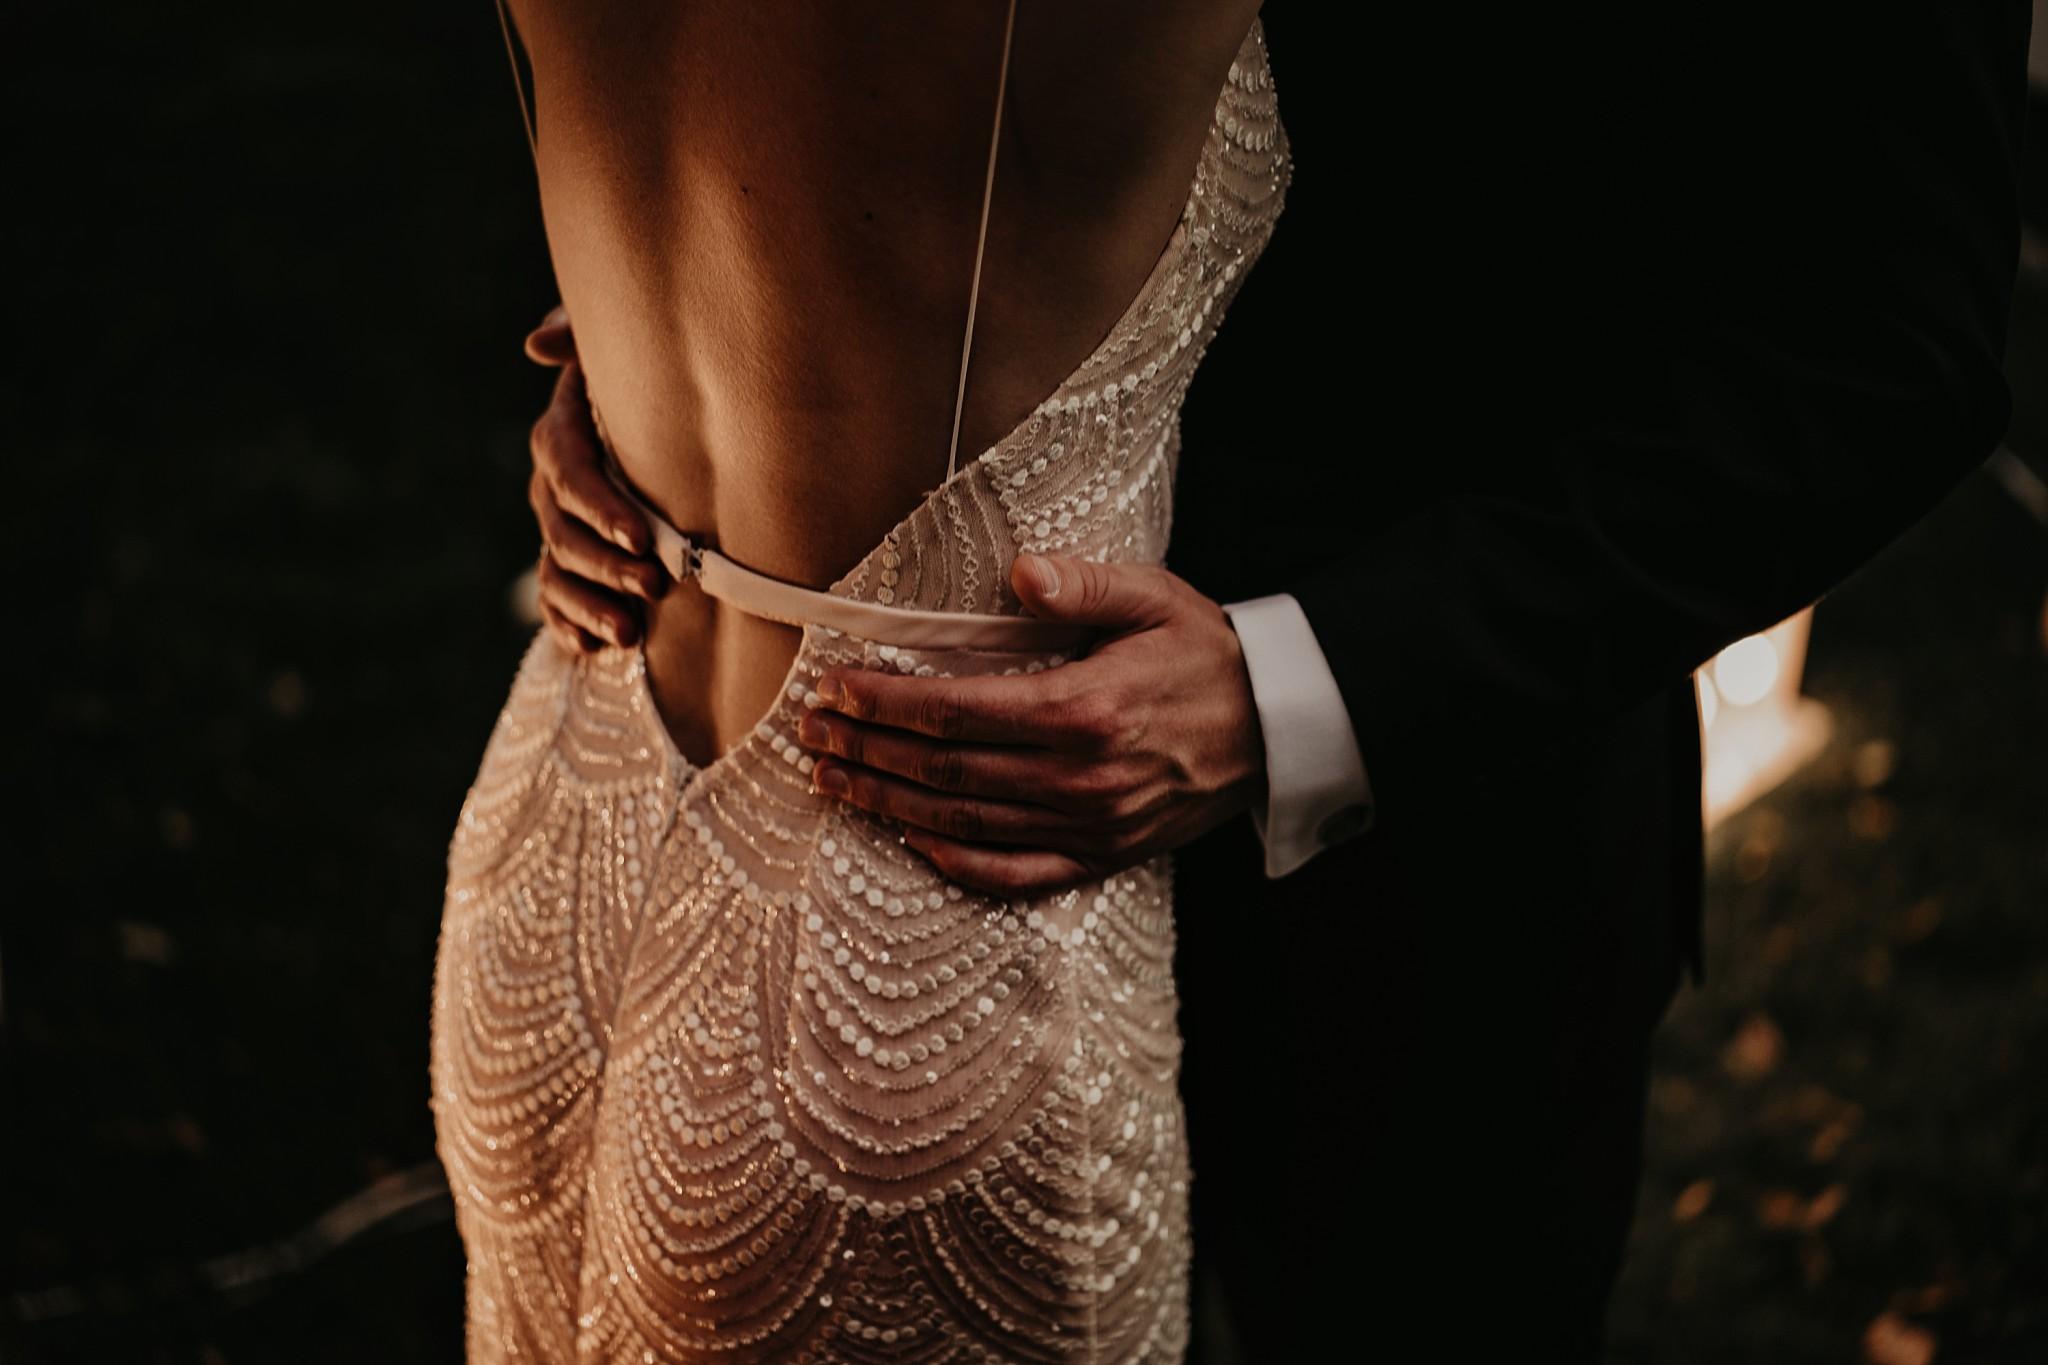 fotograf poznan wesele dobra truskawka piekne wesele pod poznaniem wesele w dobrej truskawce piekna para mloda slub marzen slub koronawirus slub listopad wesele koronawirus 346